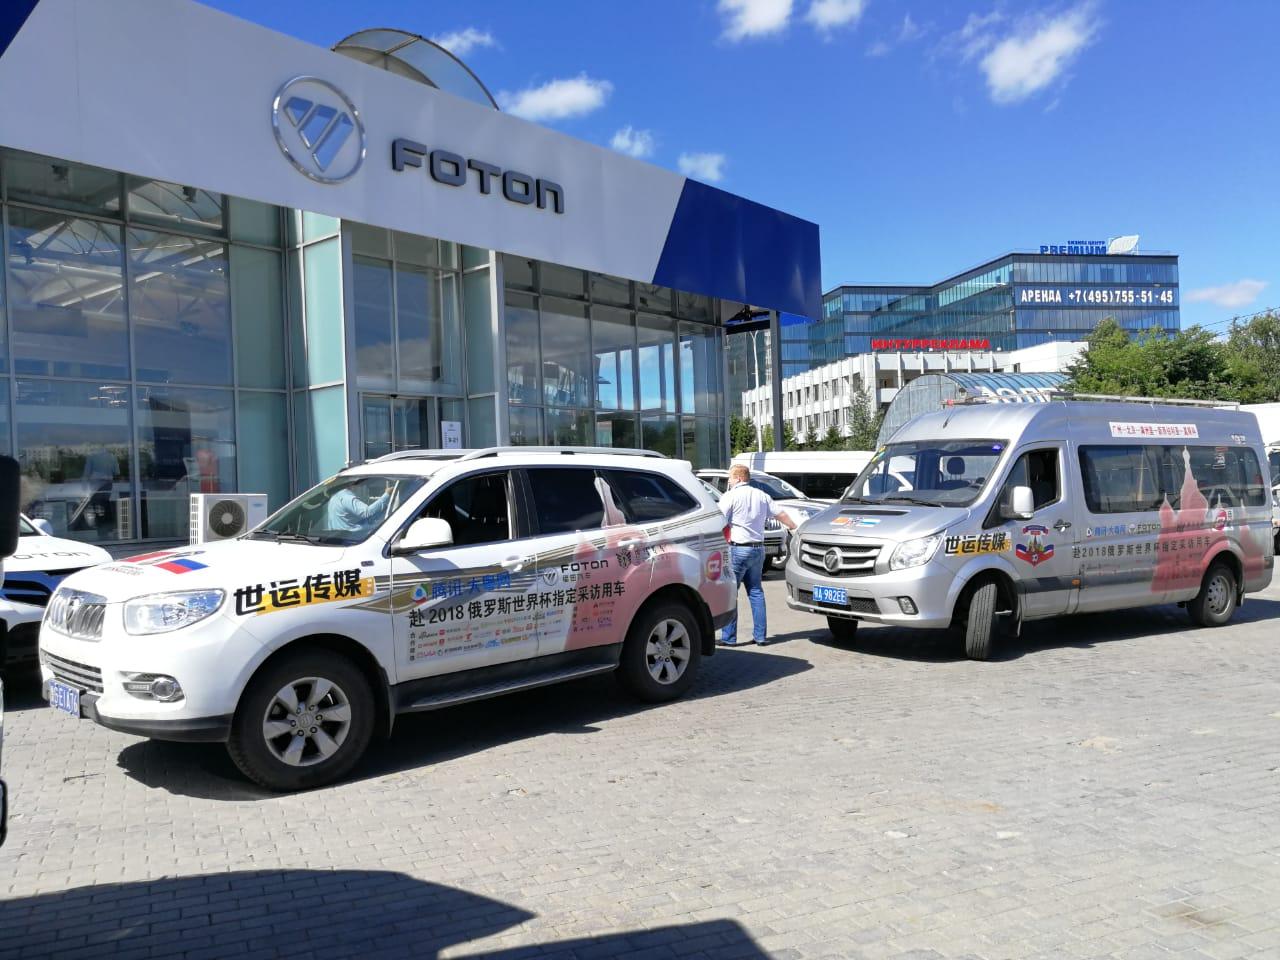 Автопробег «Гуанчжоу-Москва» на автомобилях Foton прибыл в Москву